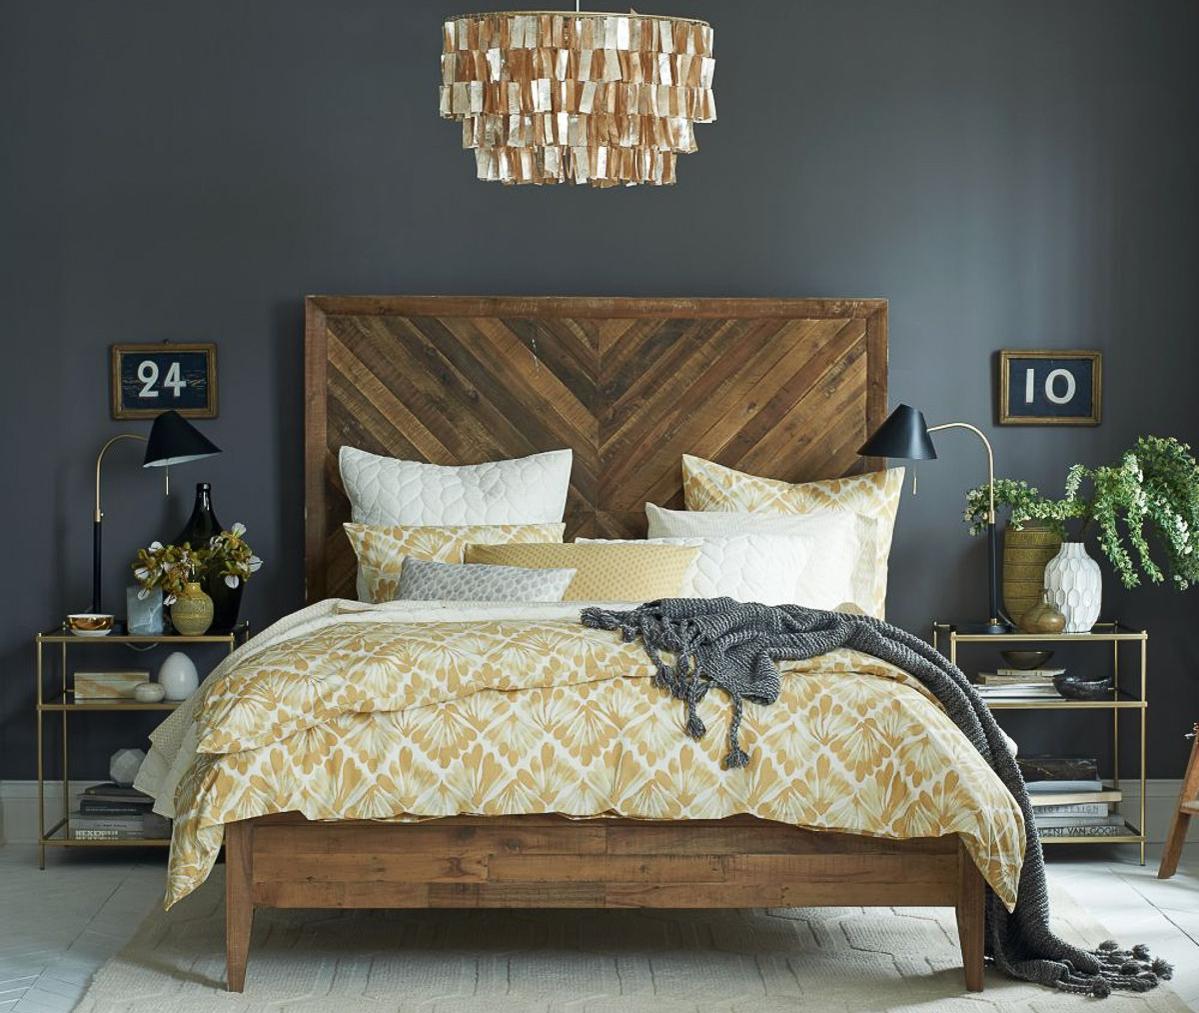 10 of the best online home interior shops - West Elm